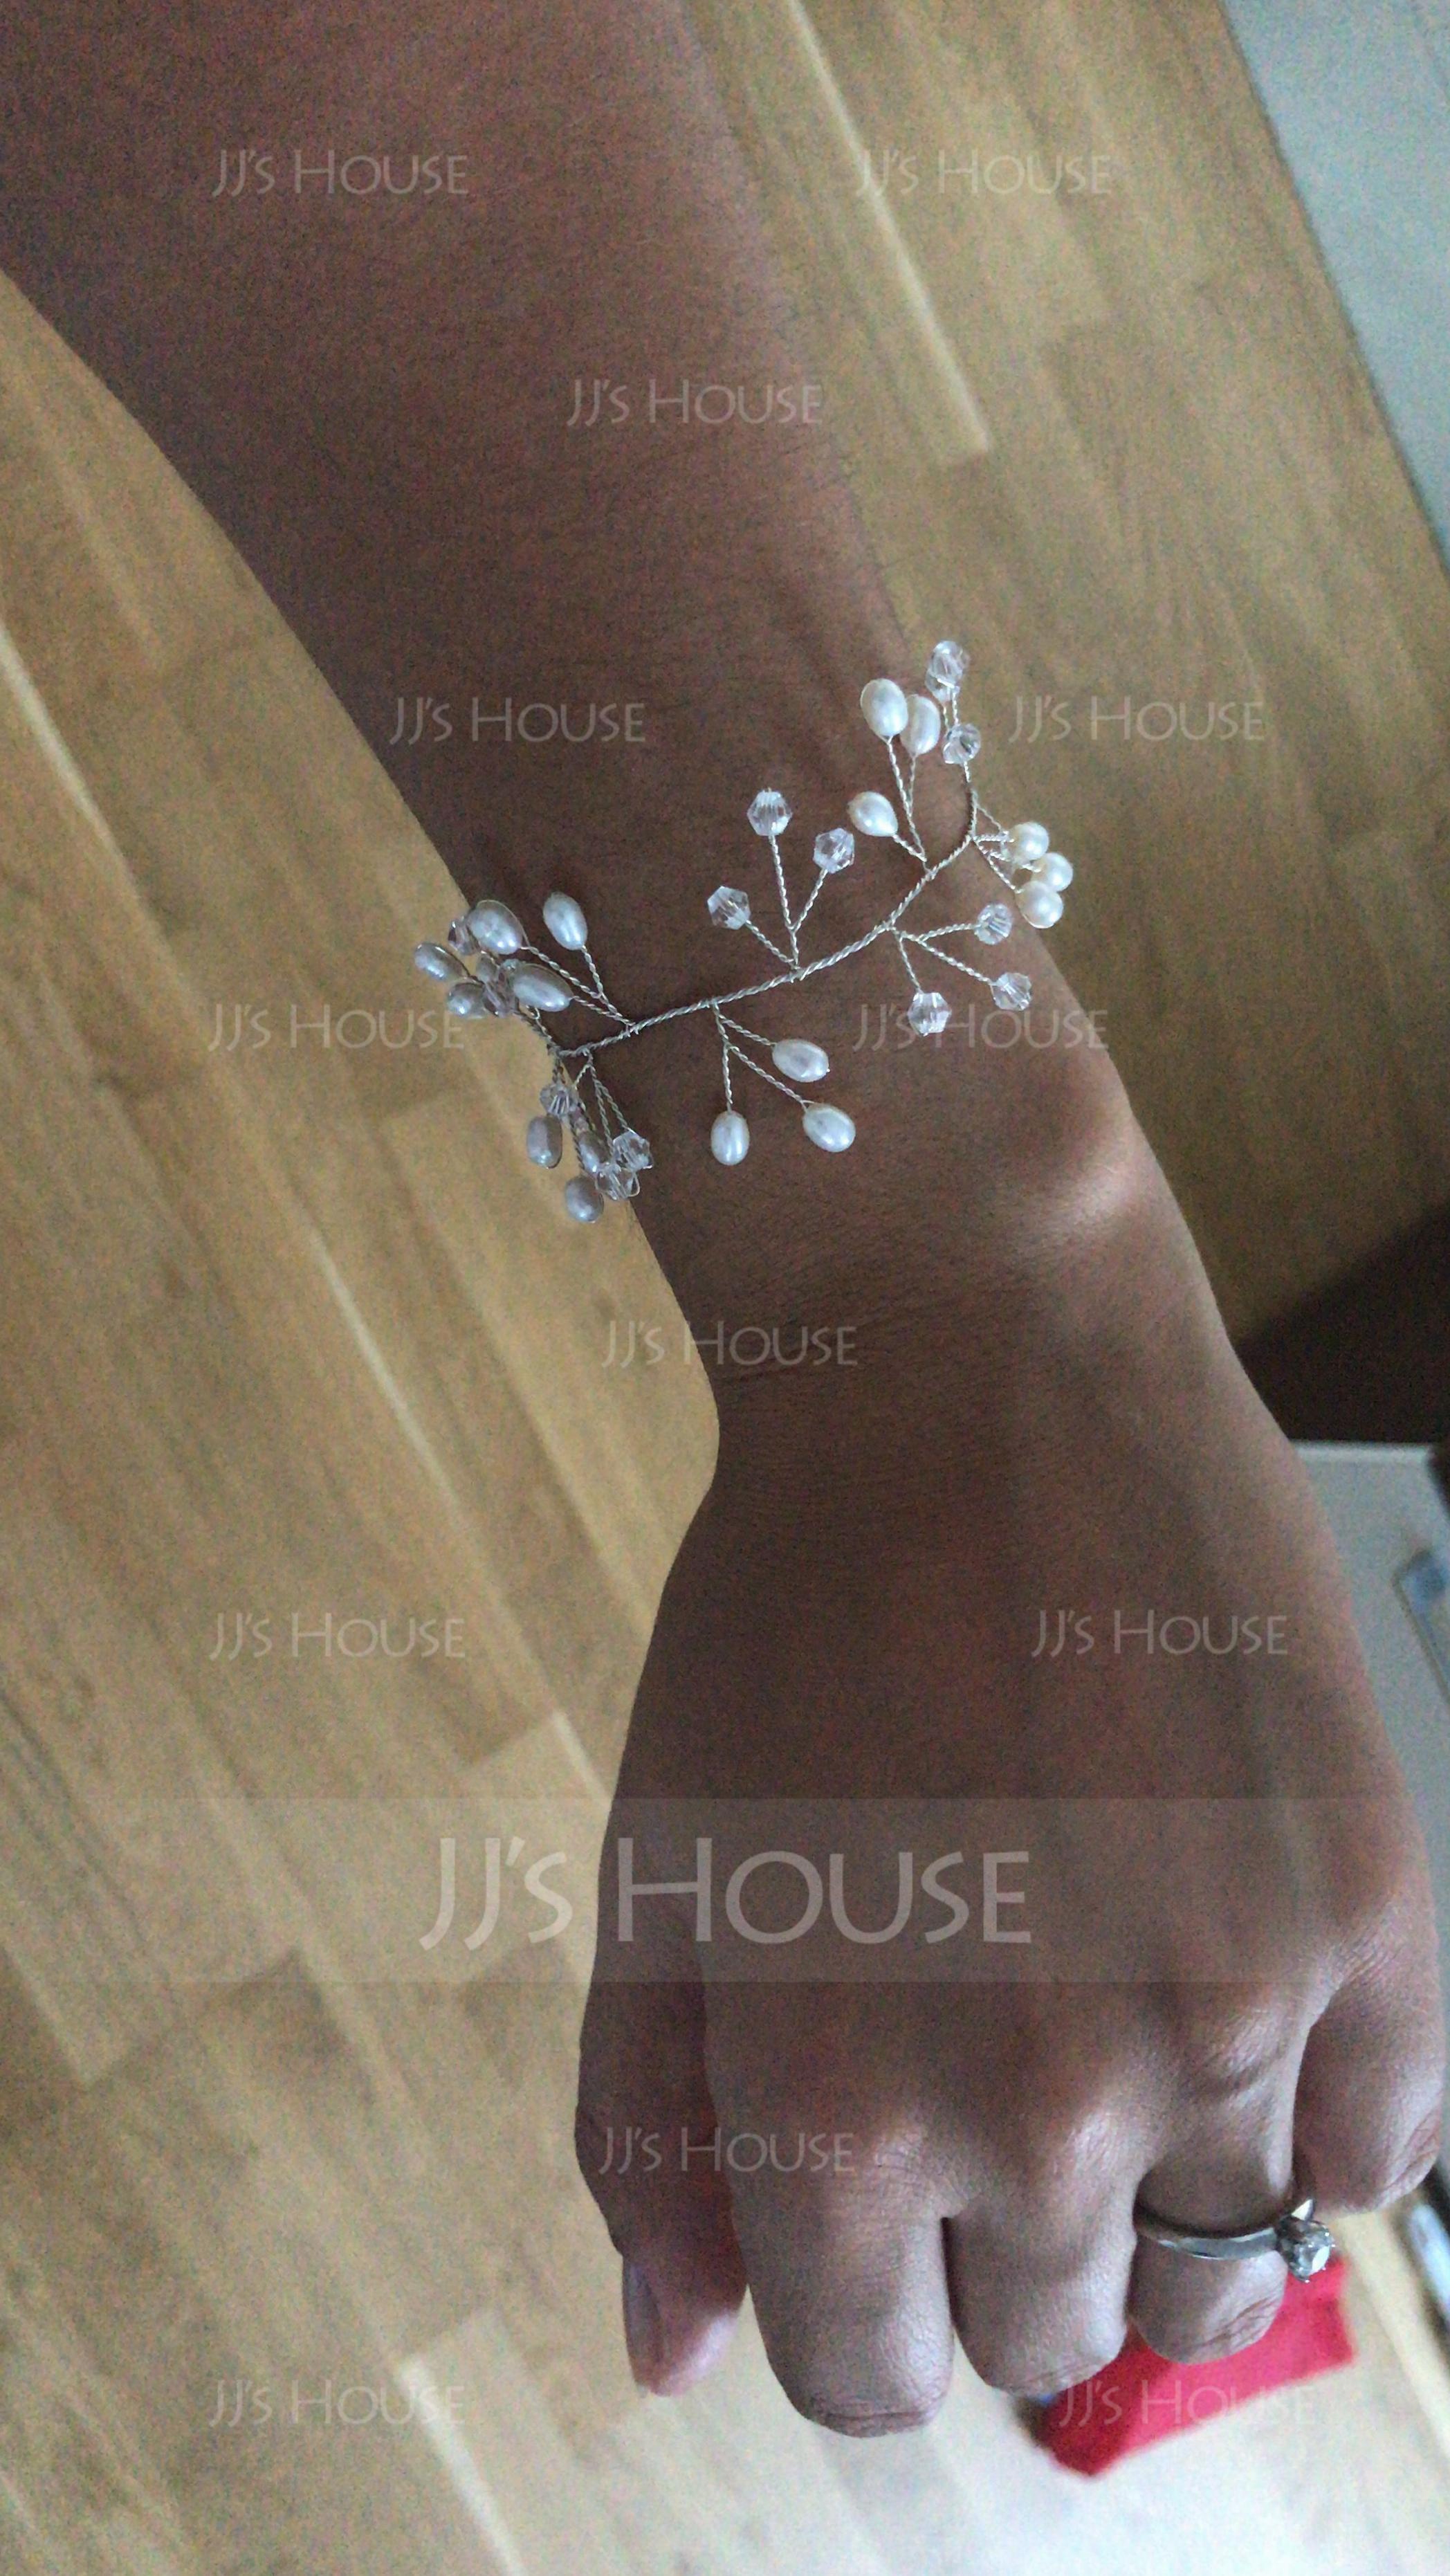 Romantic Alloy/Imitation Pearls With Imitation Pearls Ladies' Bracelets (011110831)